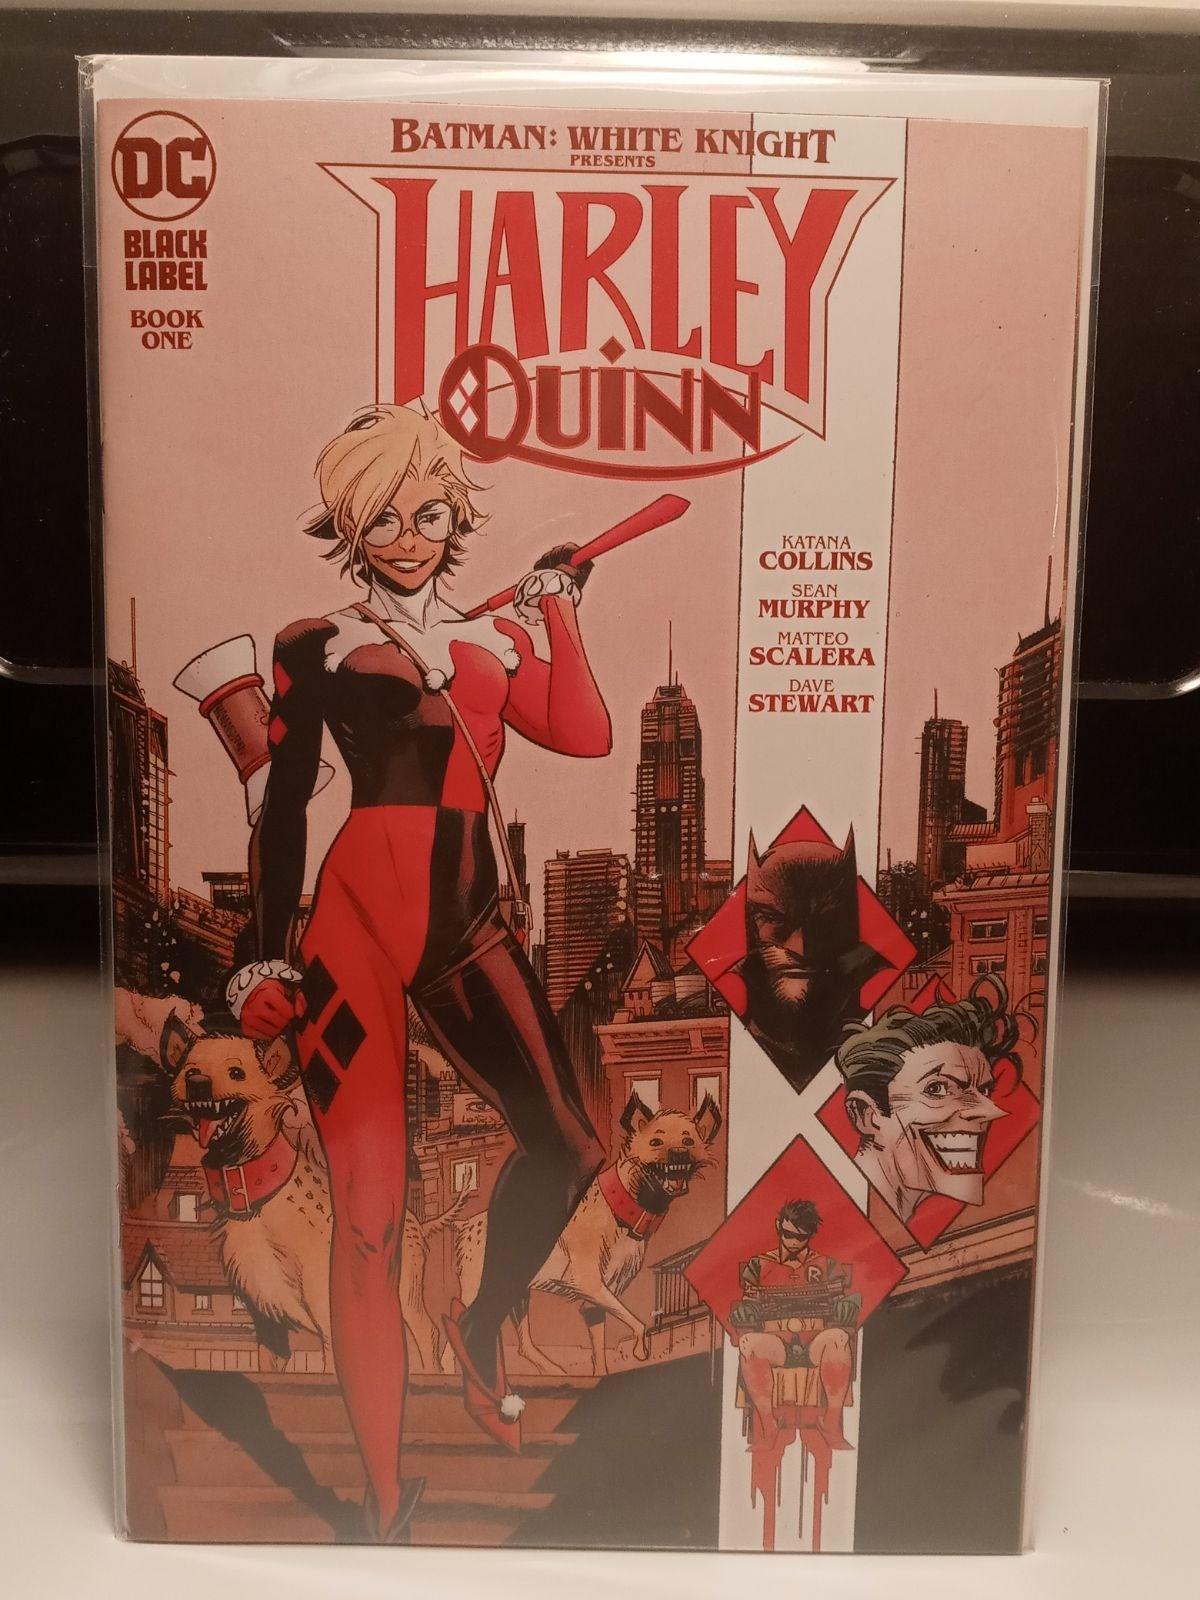 Harley quinn comics